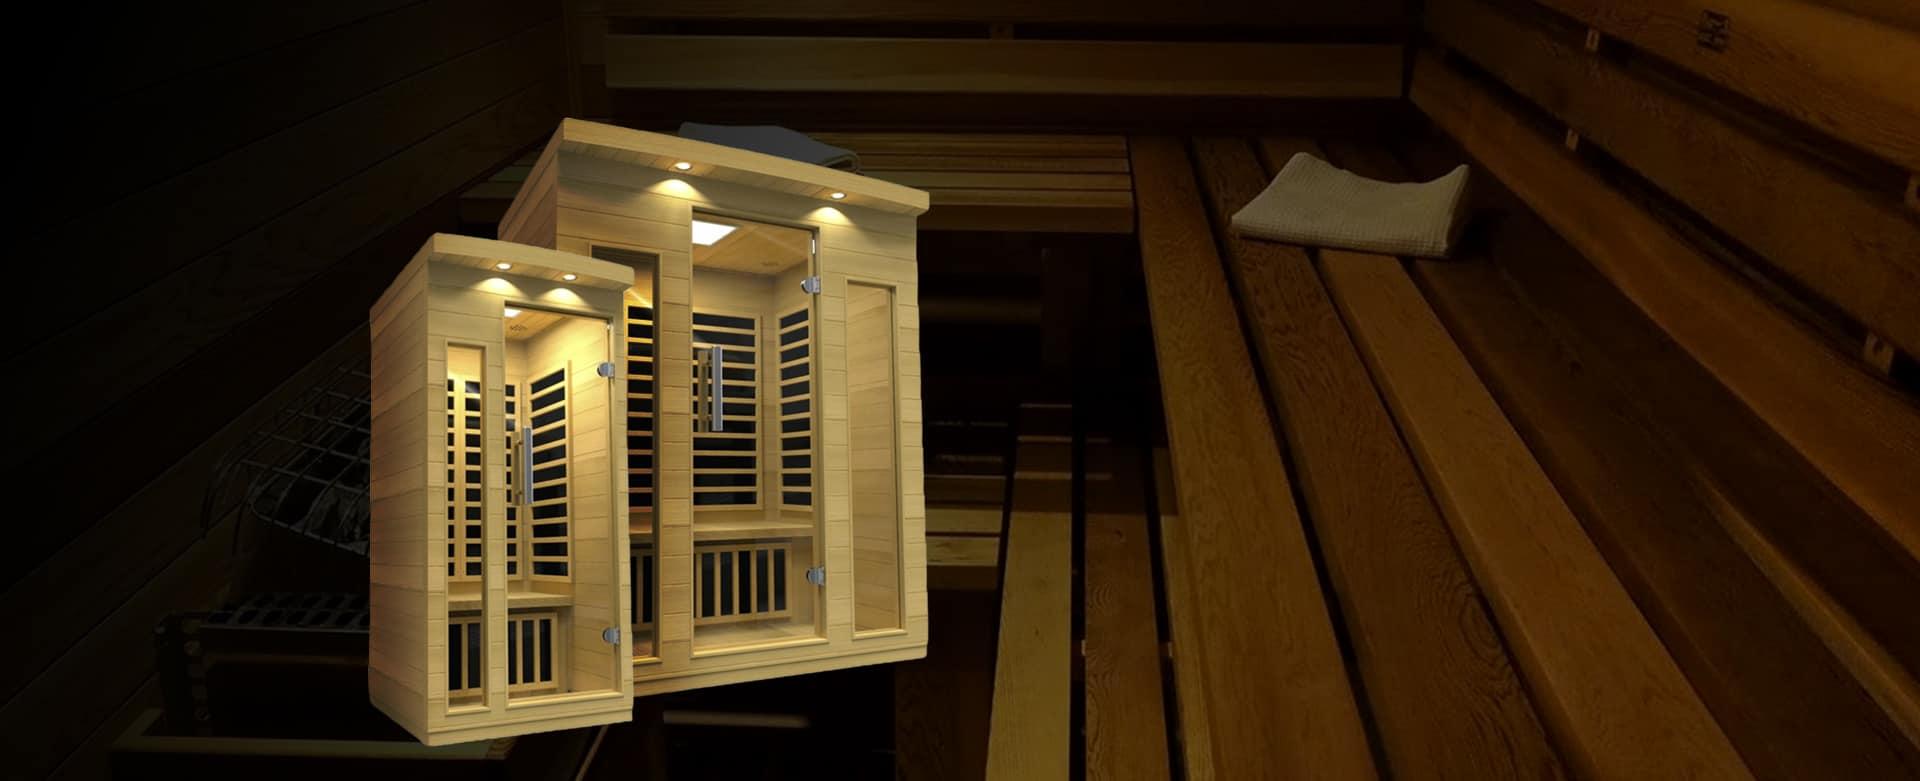 Miami Spas Sauna Slide